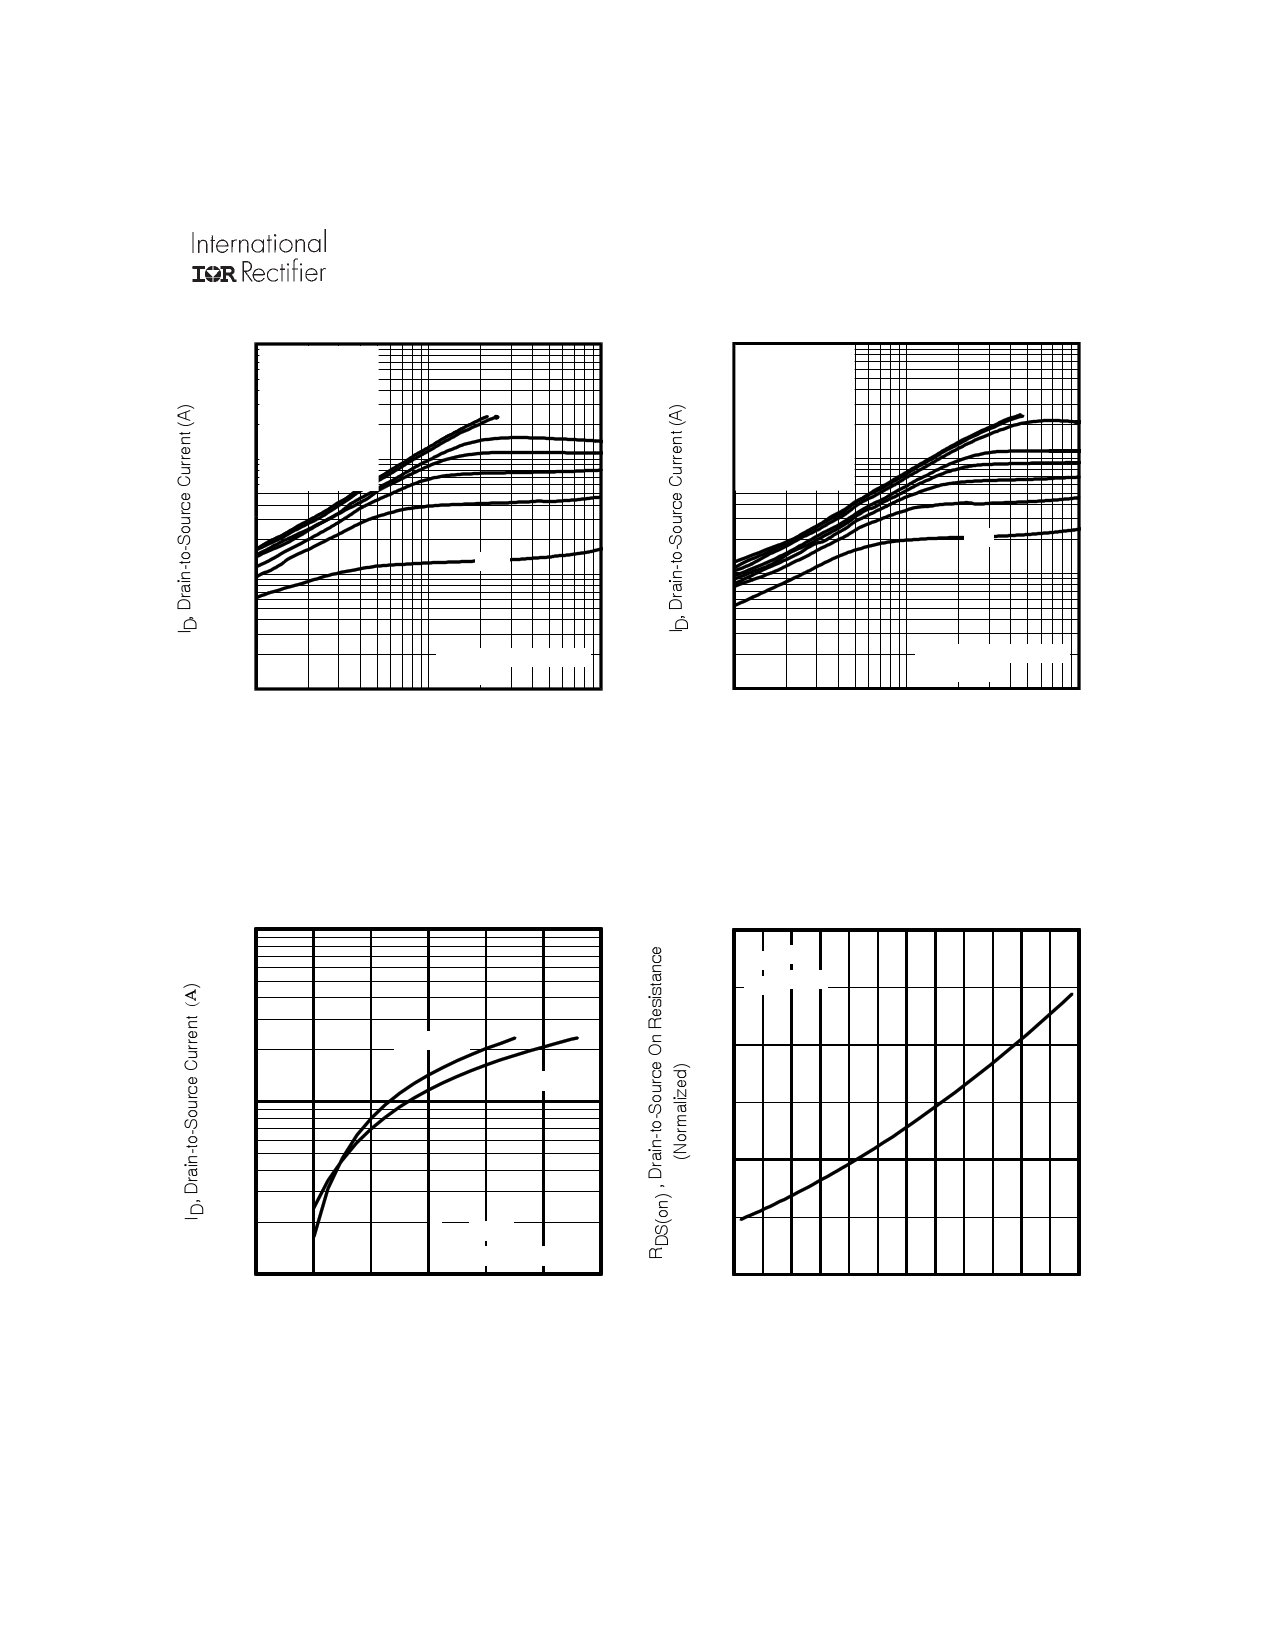 IRF3707ZCLPbF pdf, ピン配列